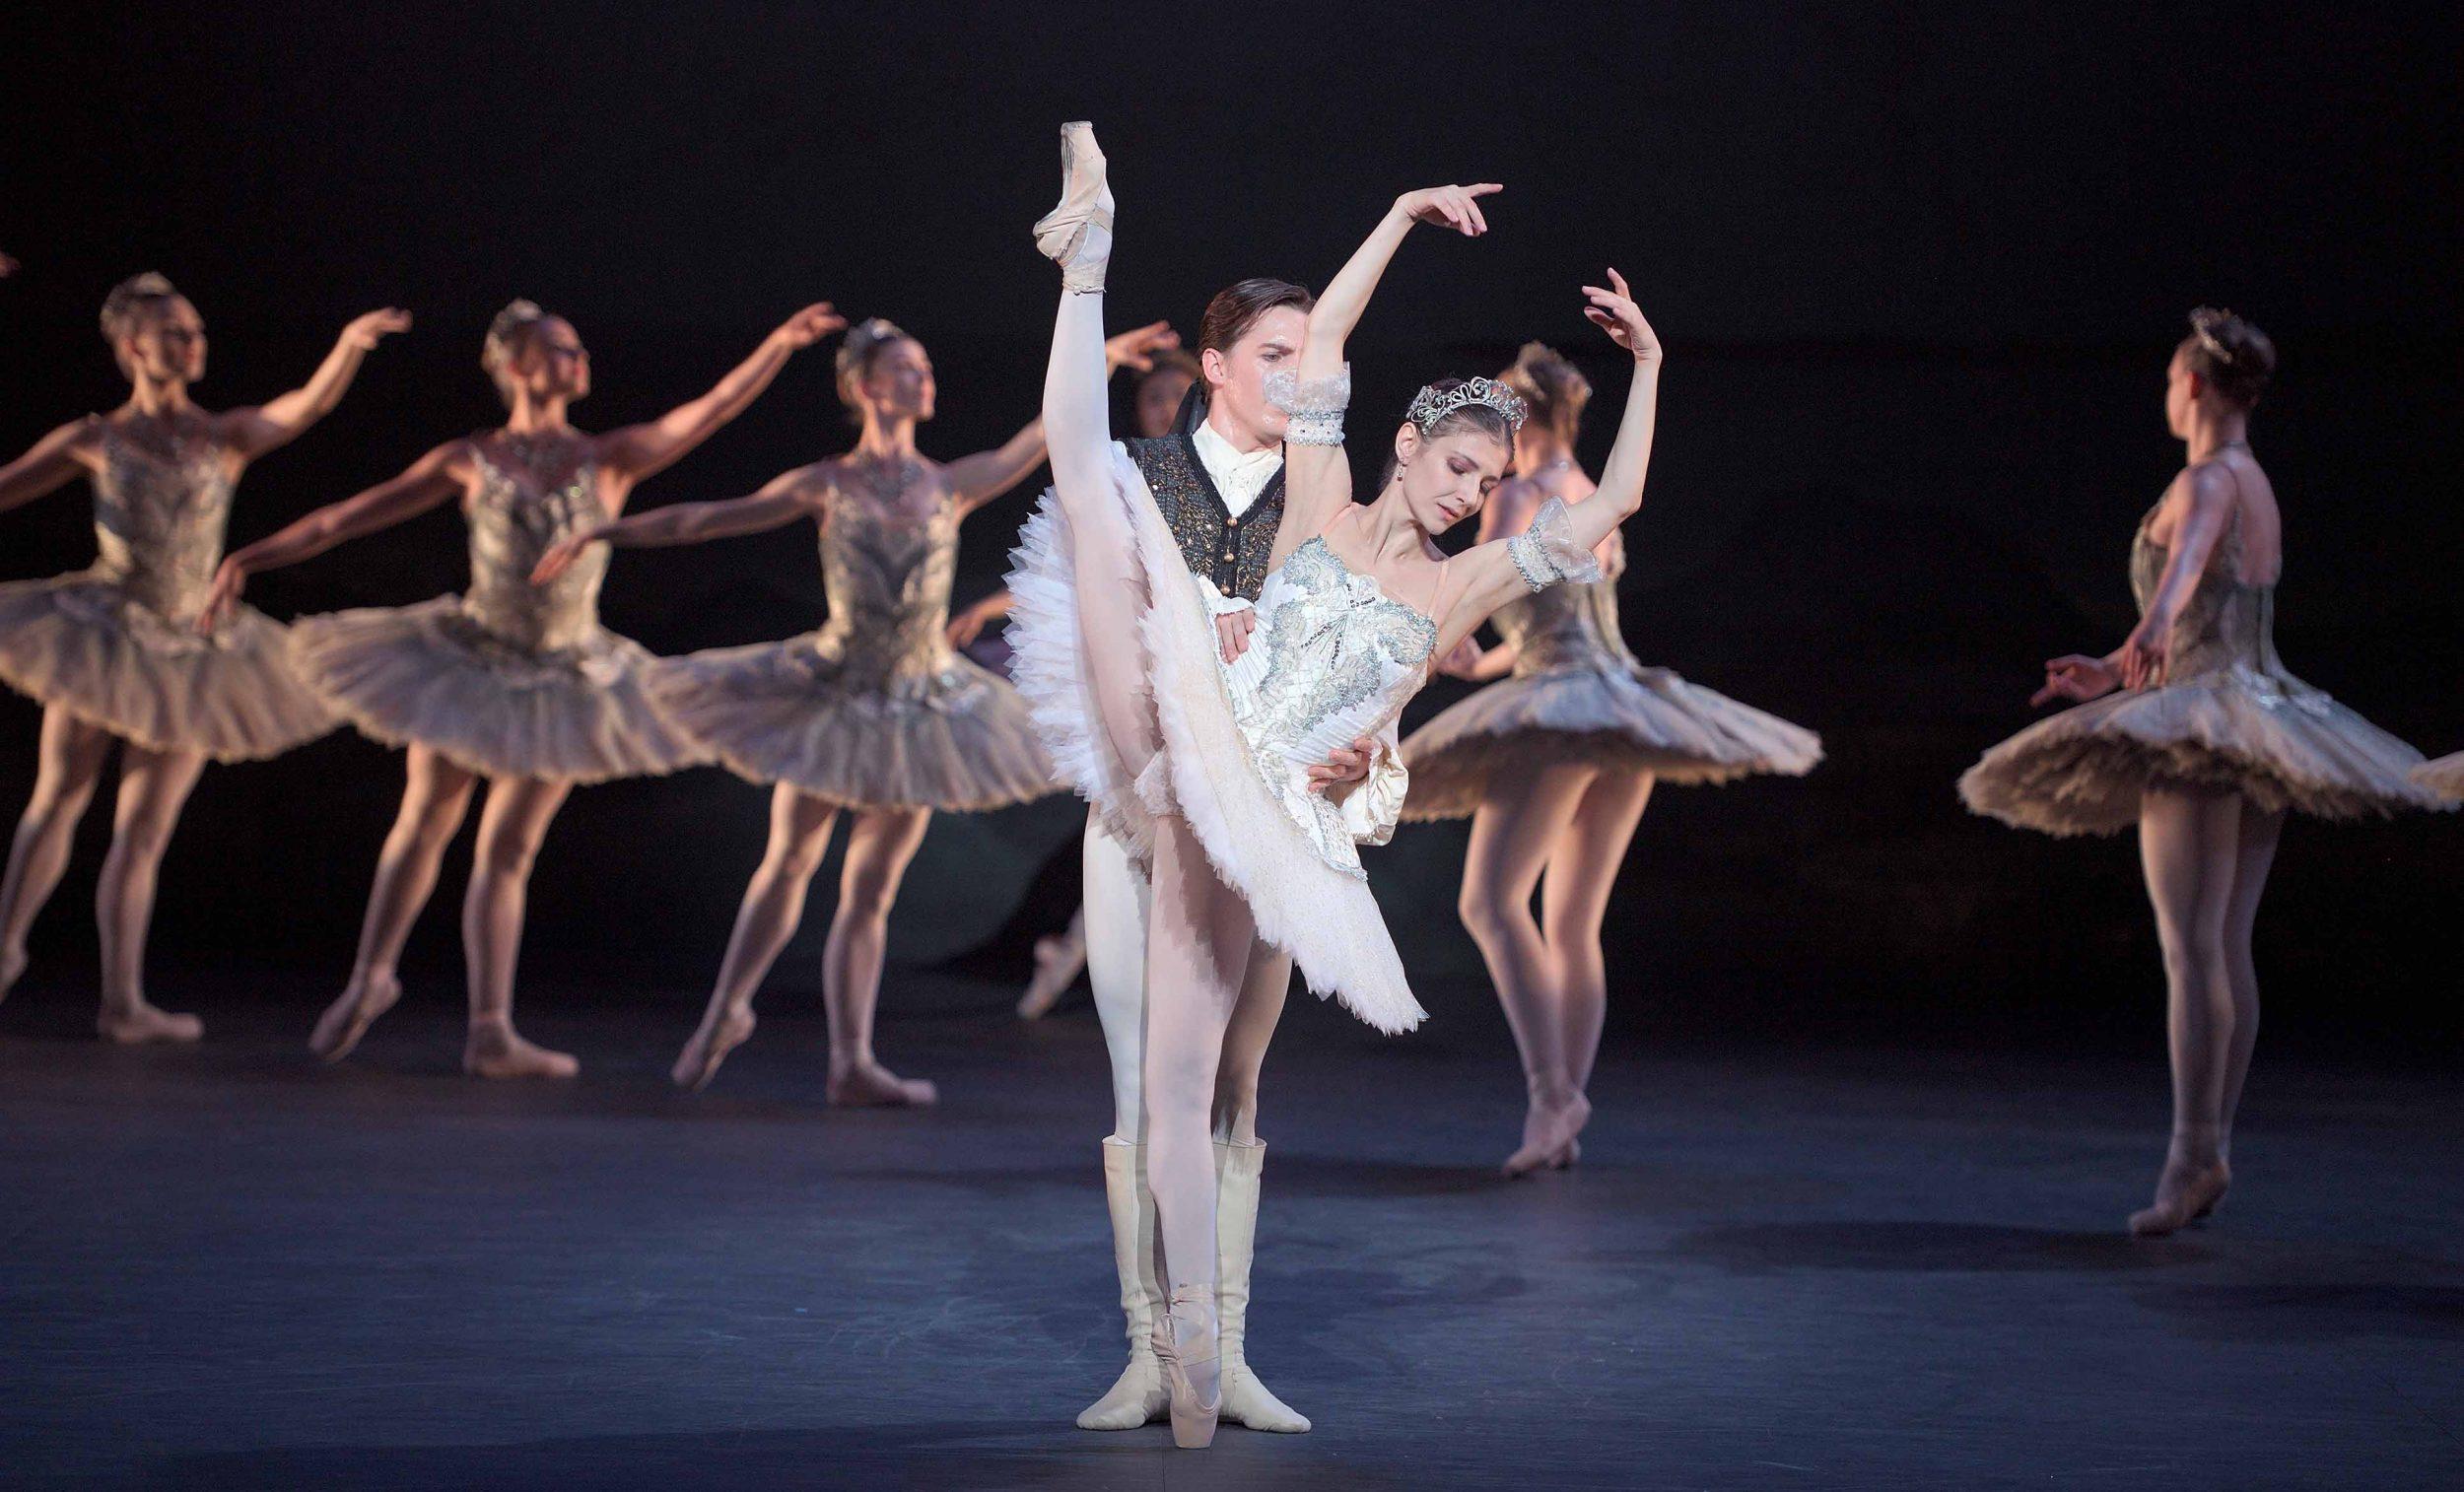 Alina-Cojocaru-as-Princess-Aurora-and-Joseph-Caley-as-Prince-Désiré-in-The-Sleeping-Beauty-©-Laurent-Liotardo-(1)_WEB